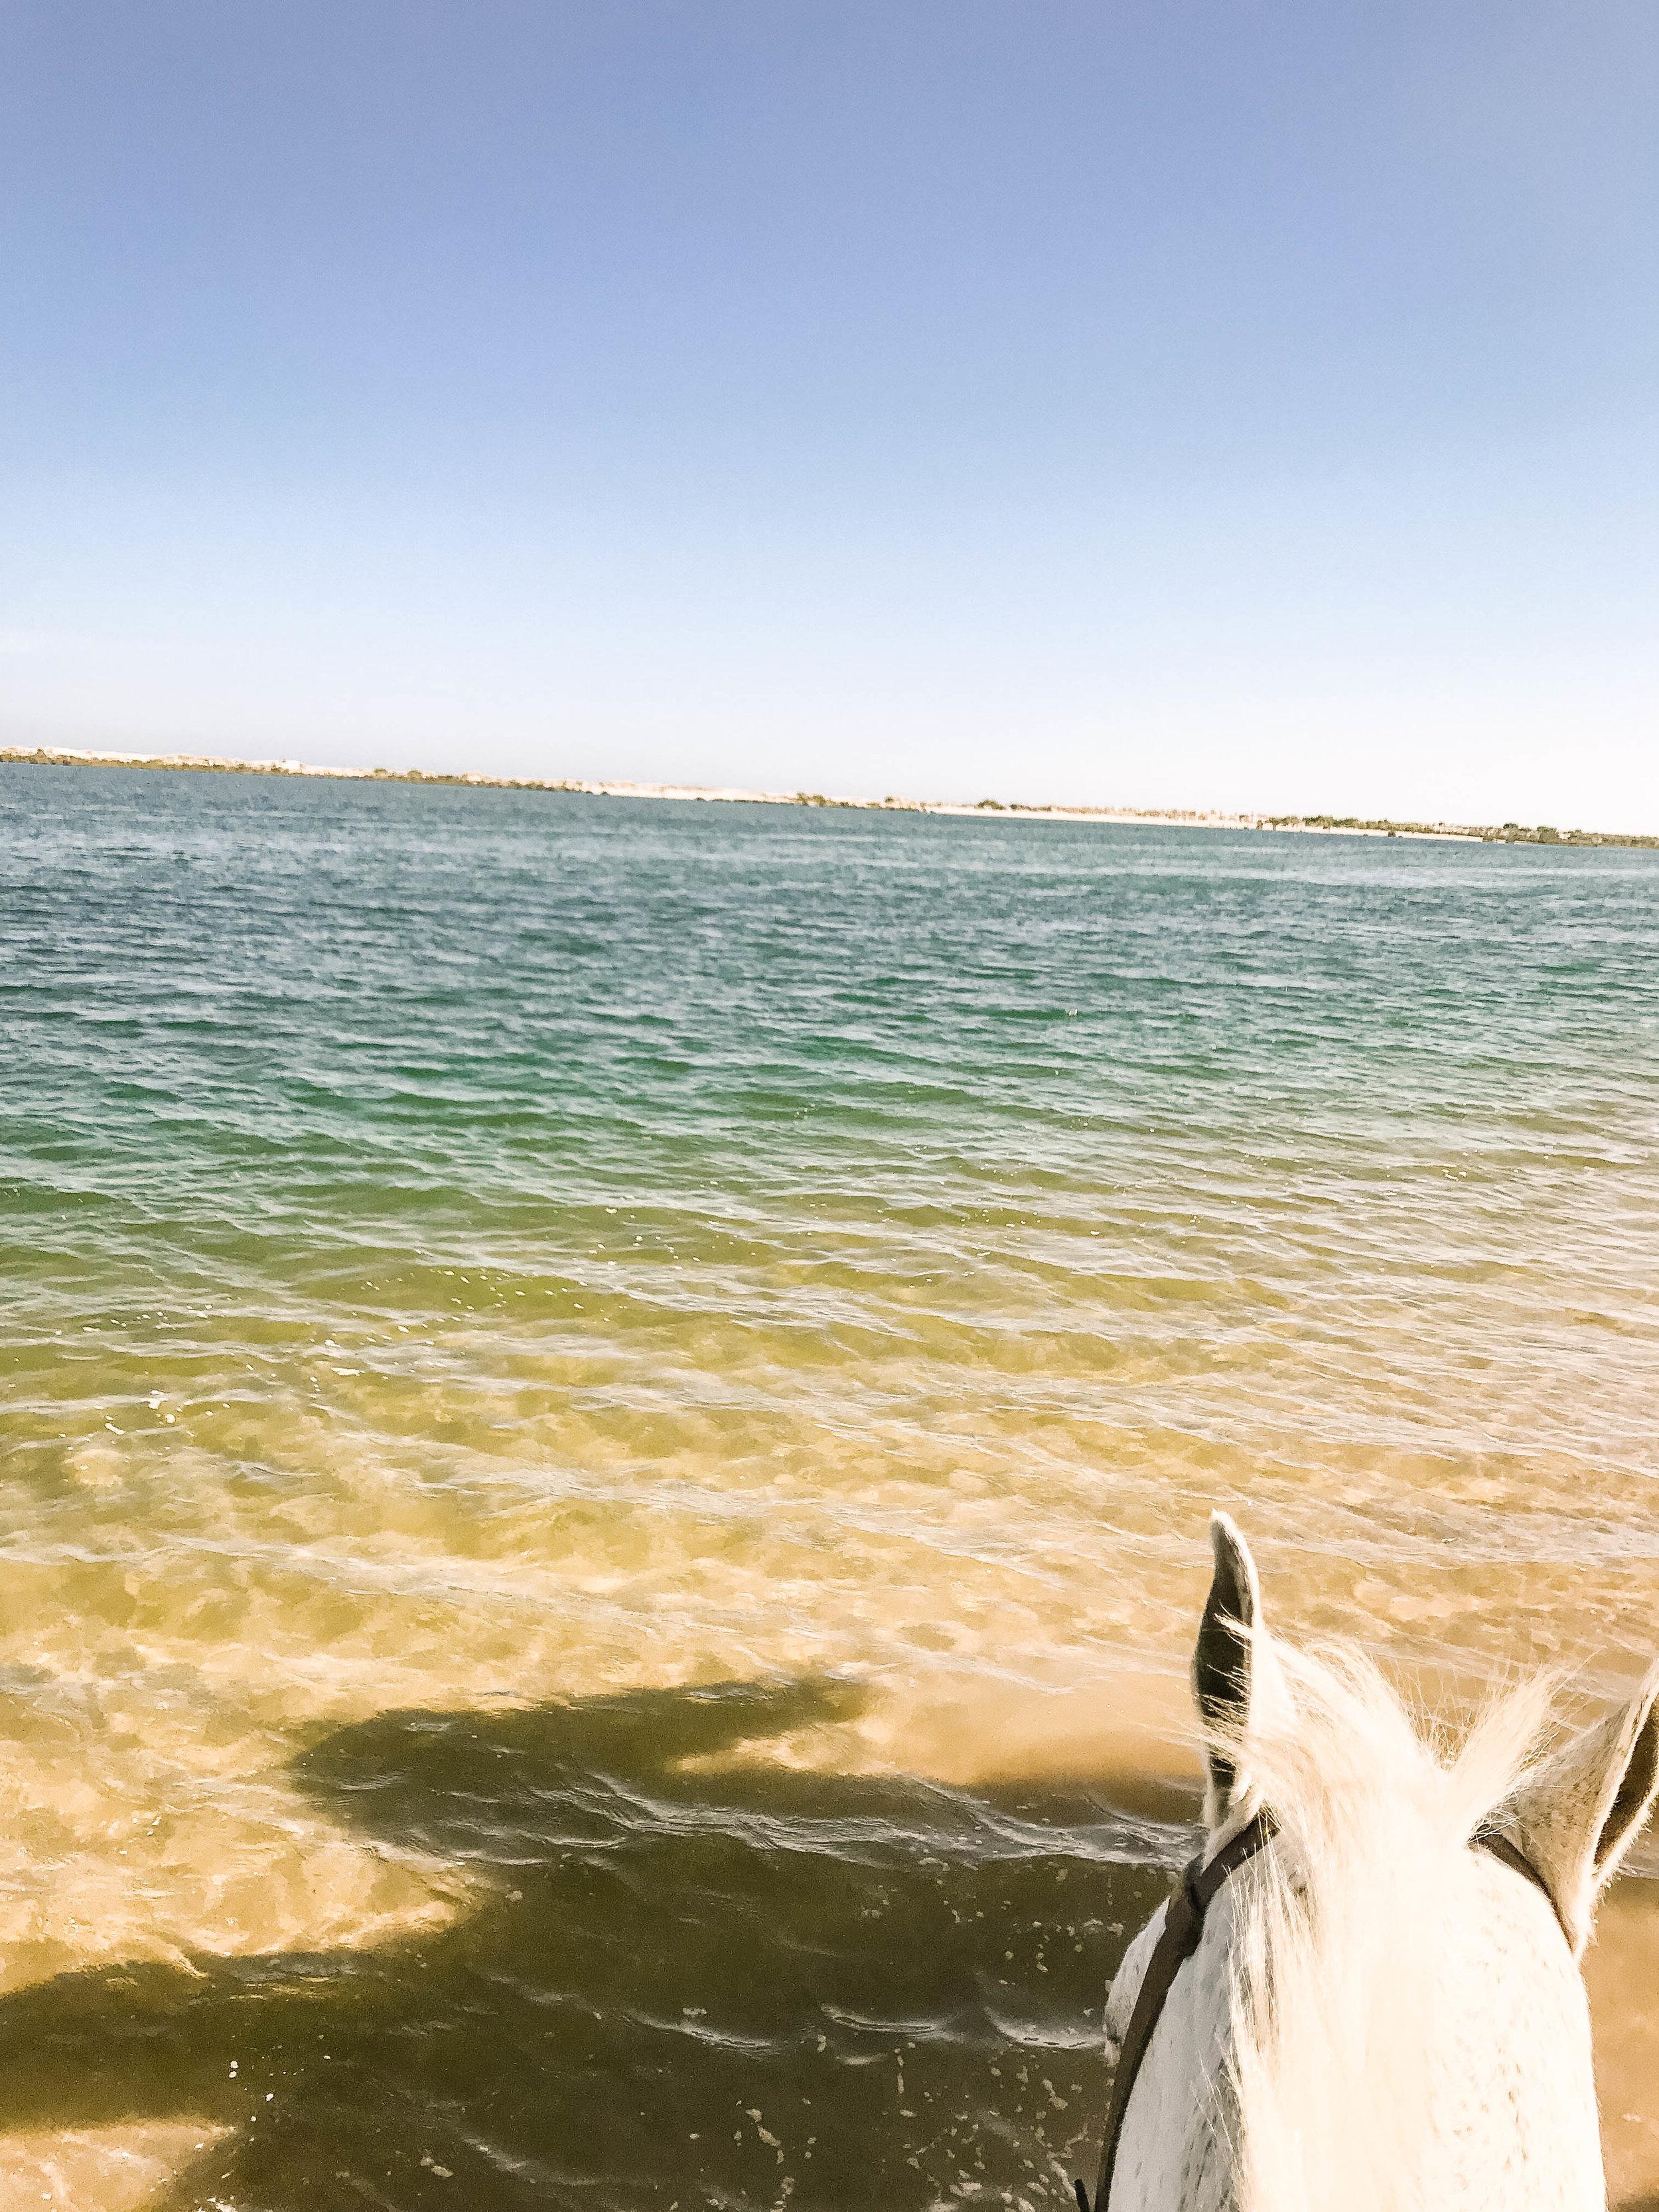 Horseback riding on the coast - ride through the water, orange trees, and vineyards